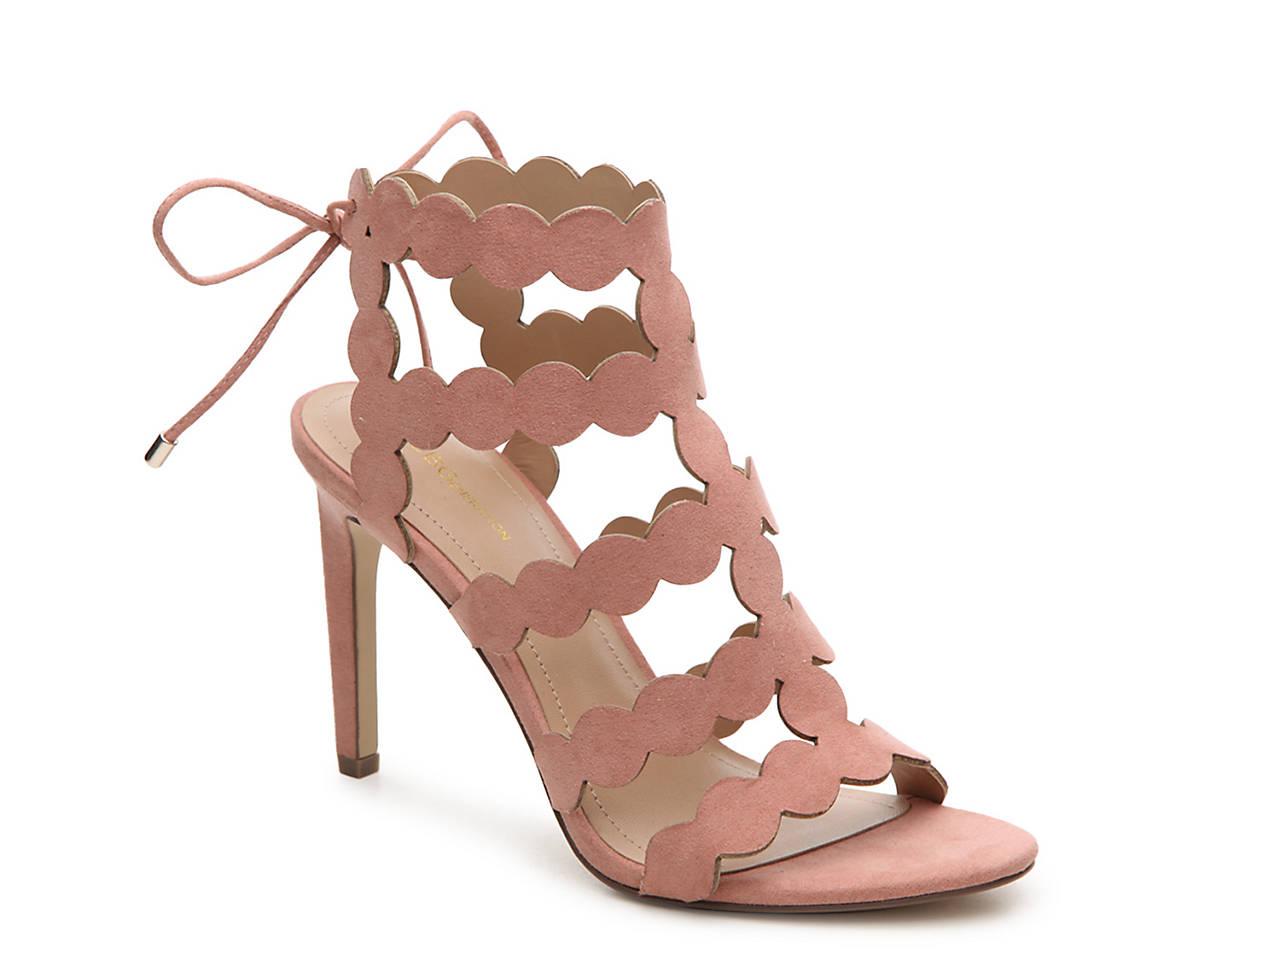 Black sandals at dsw - Chiko Sandal